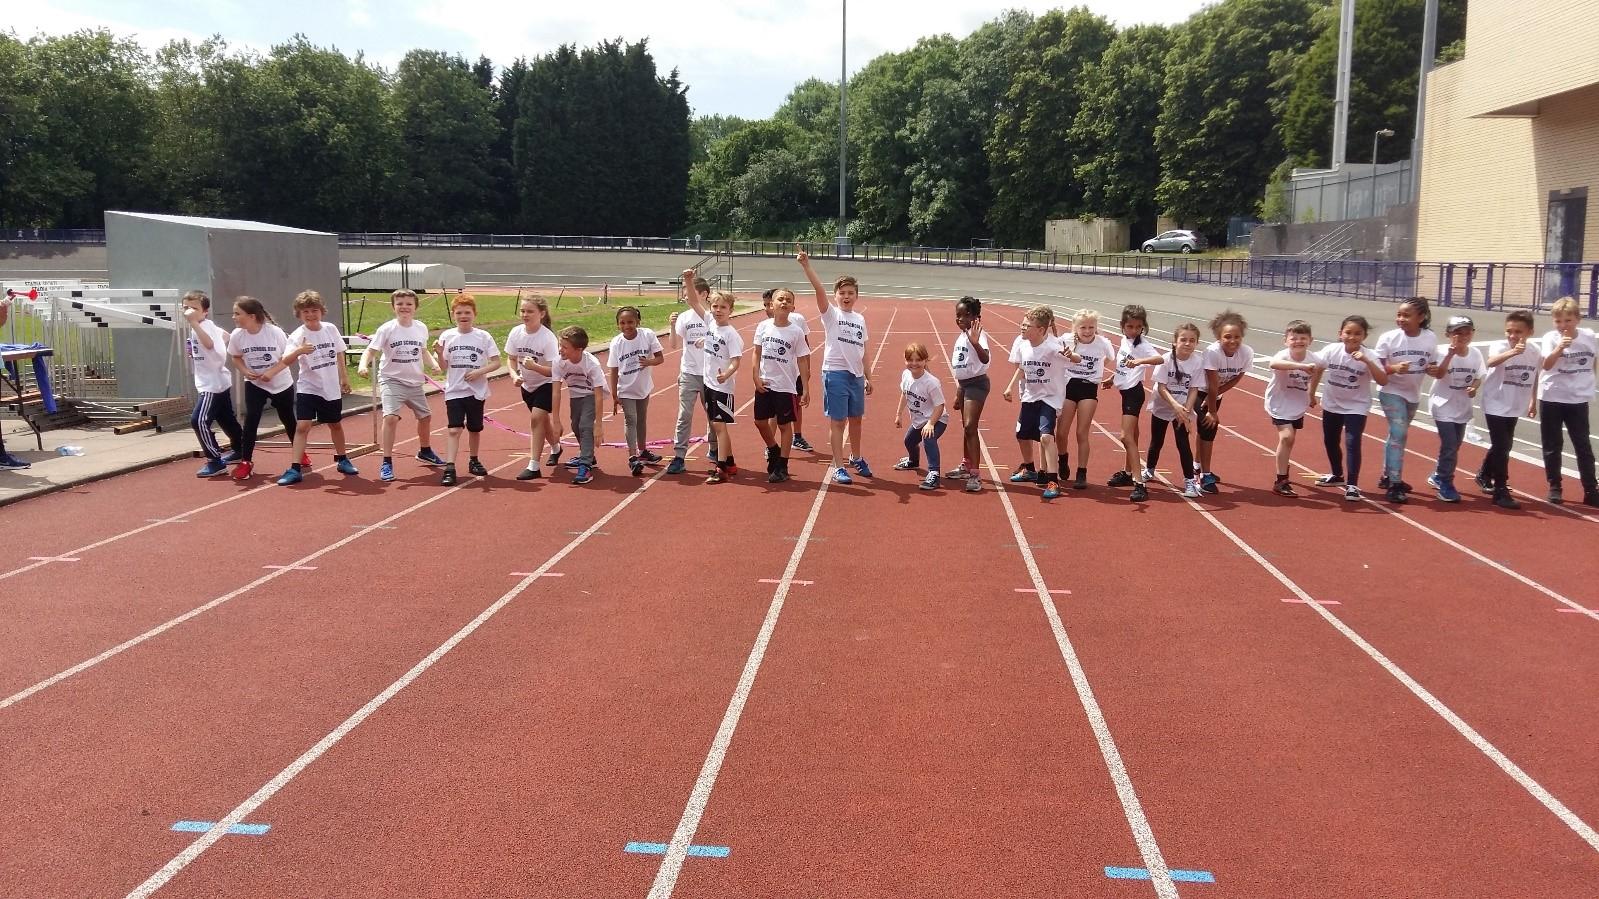 The Great School Run